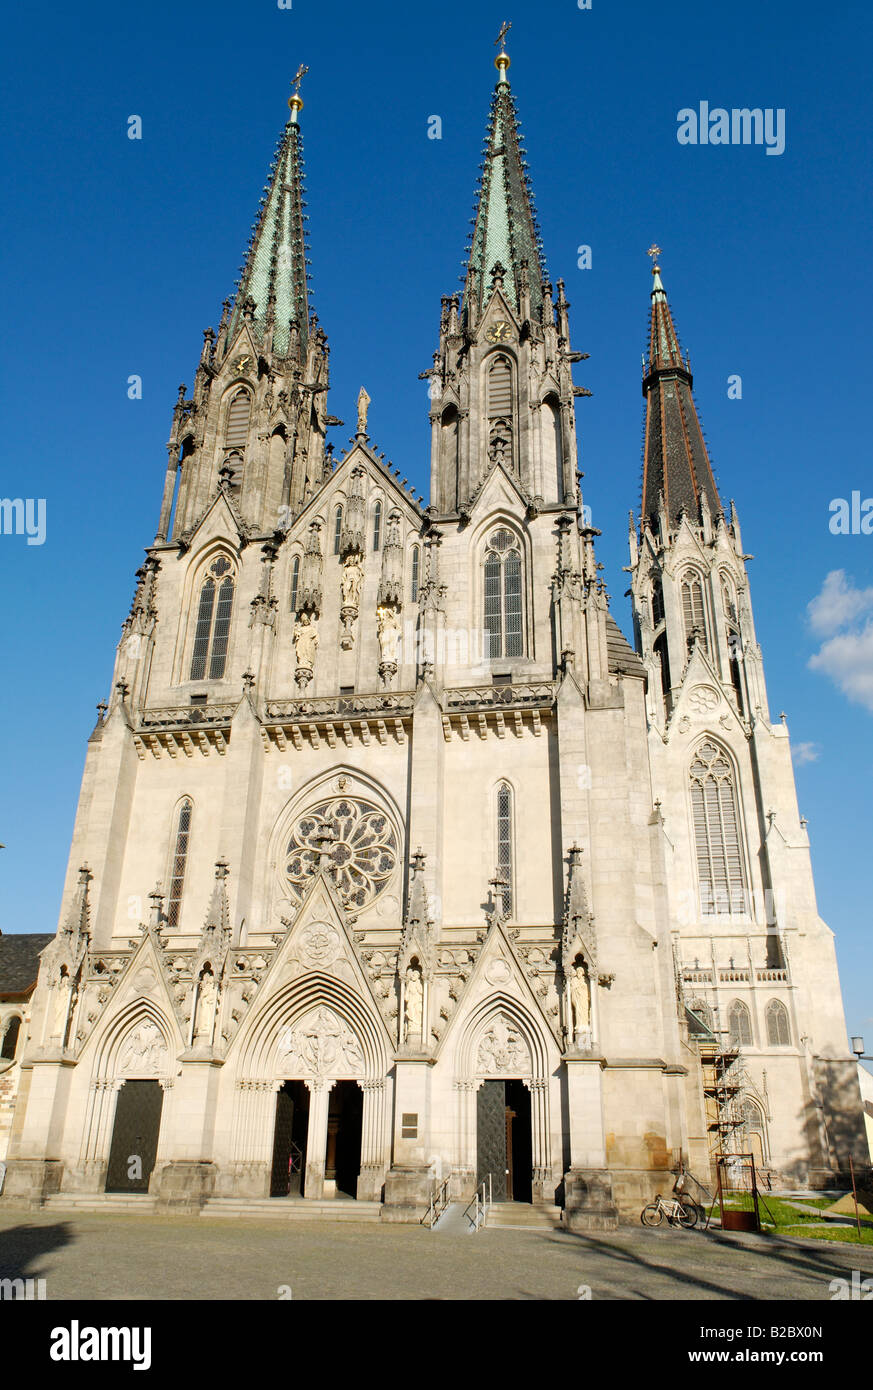 Cathedral of Olomouc, Olomouc, North Moravia, Czech Republic, Europe - Stock Image